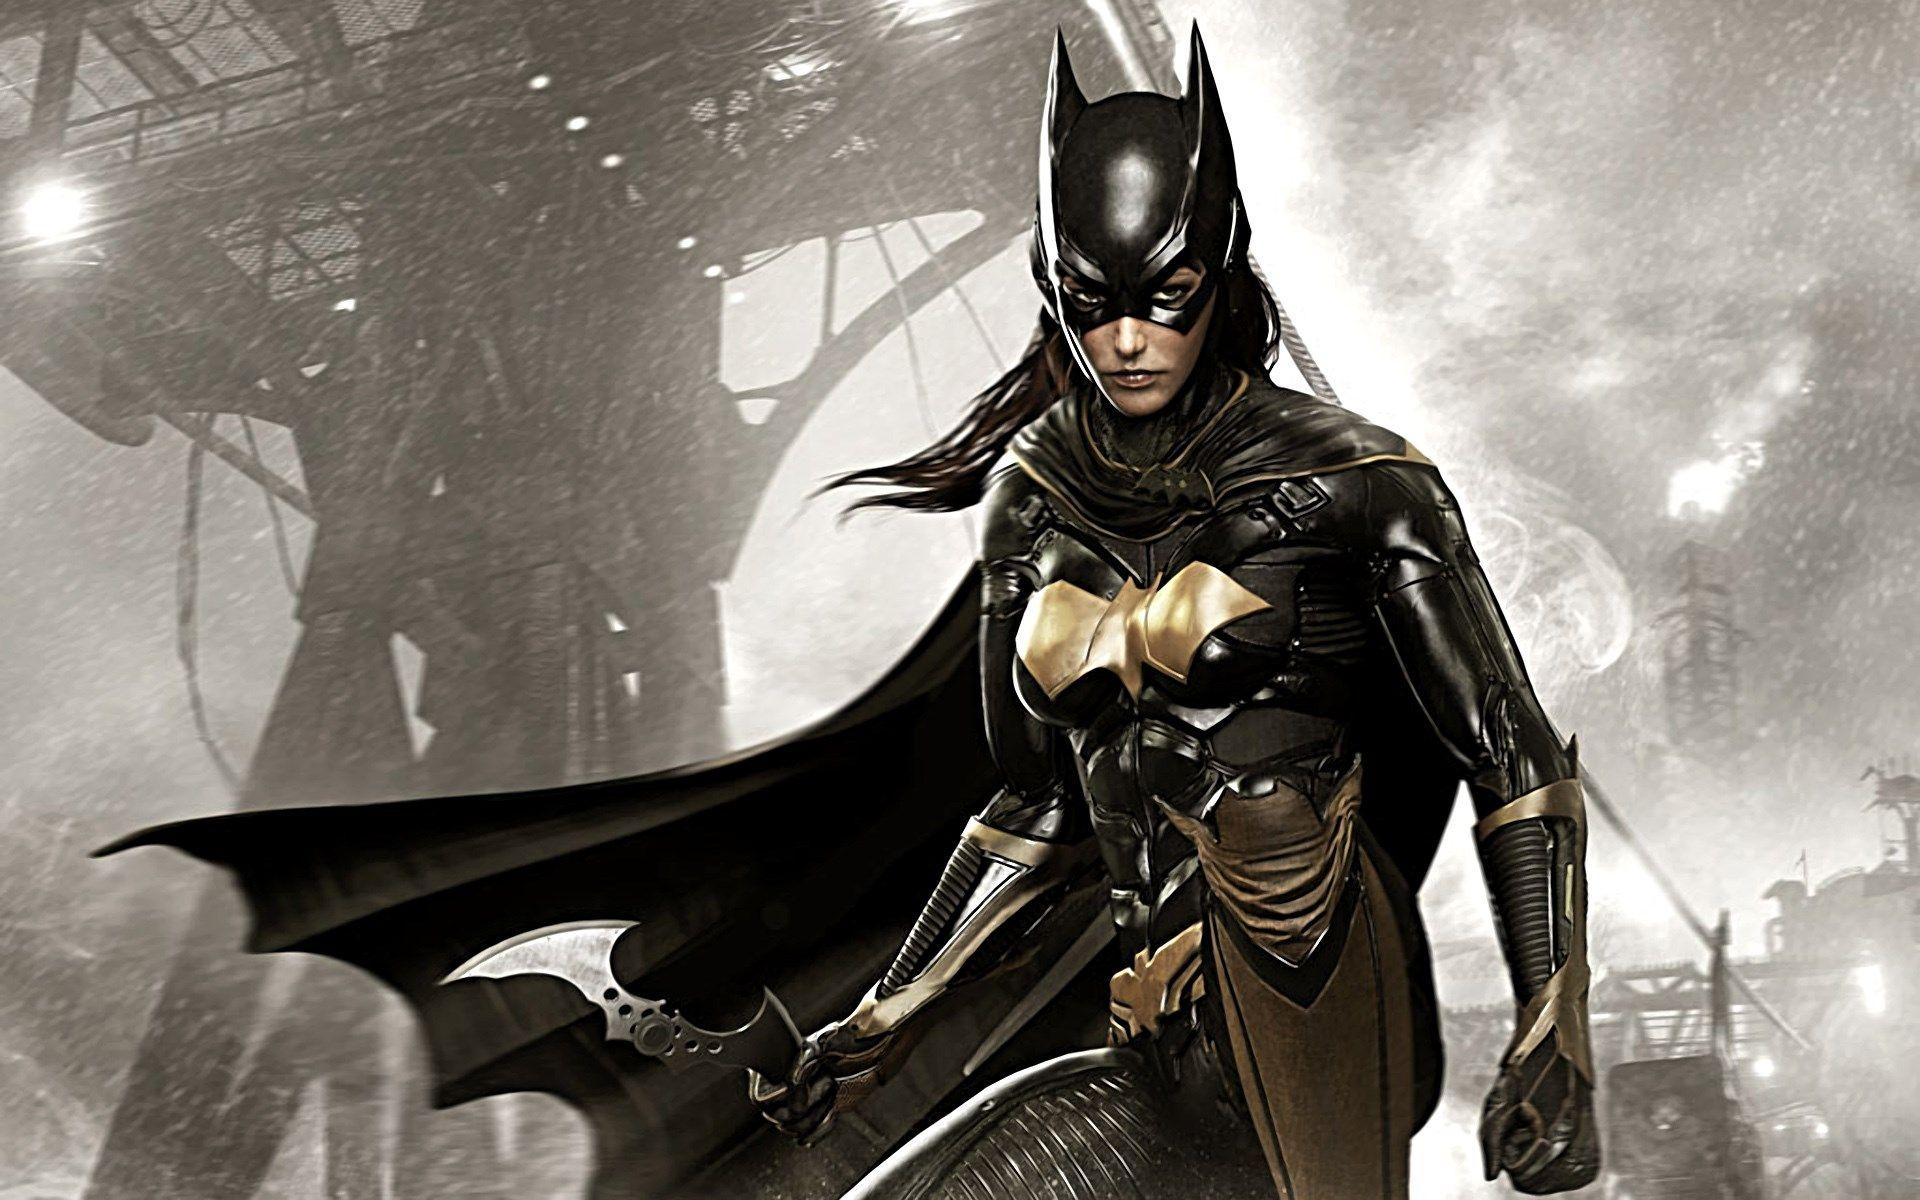 1503040 Pictures For Desktop Batman Arkham Knight Wallpaper